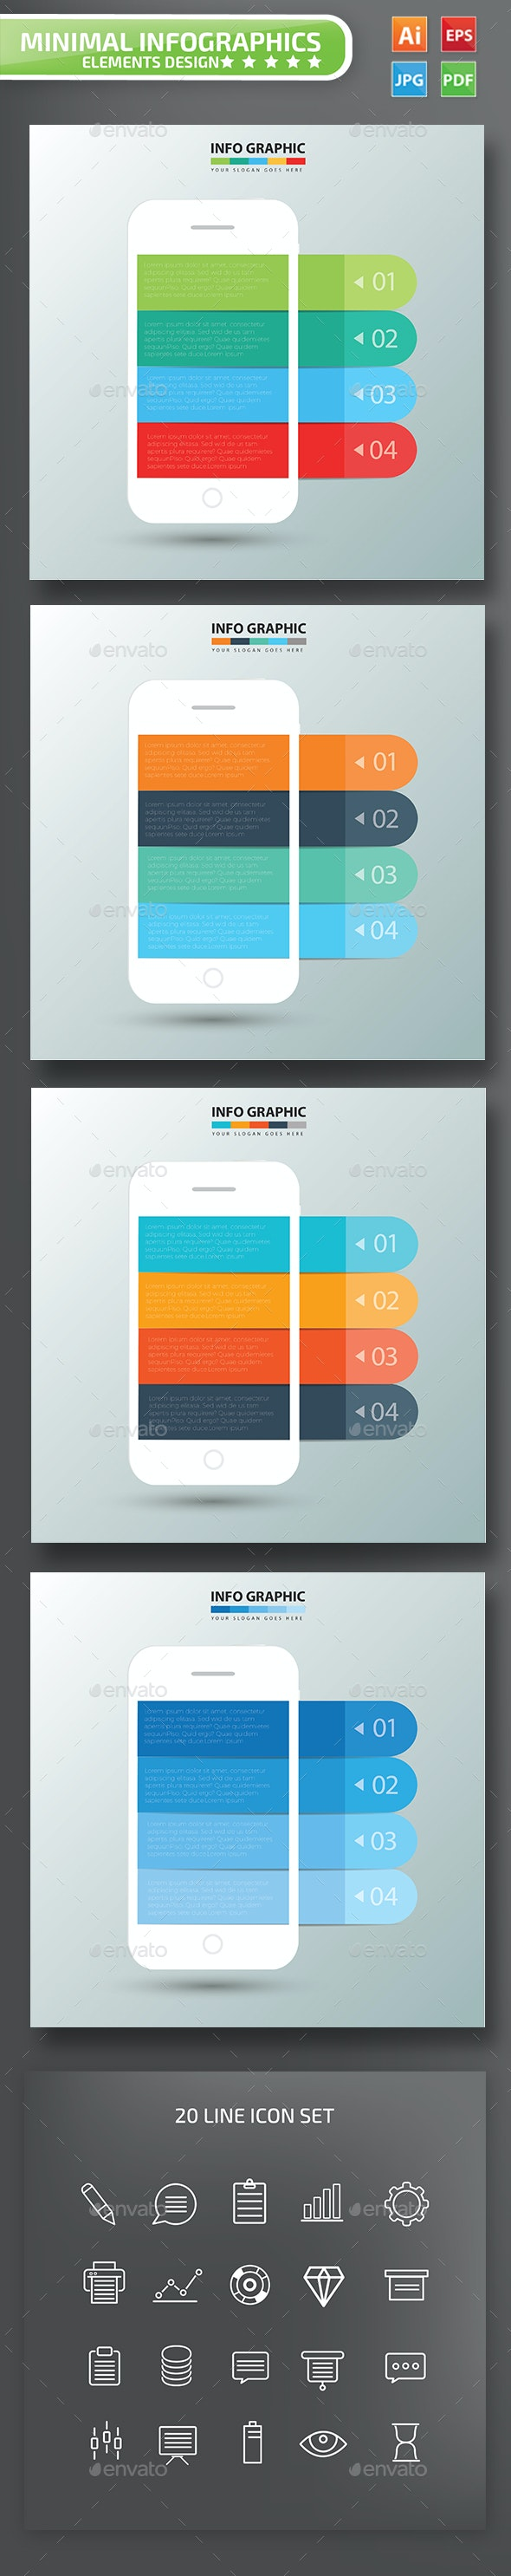 Mobile phone Infographic Design - Infographics